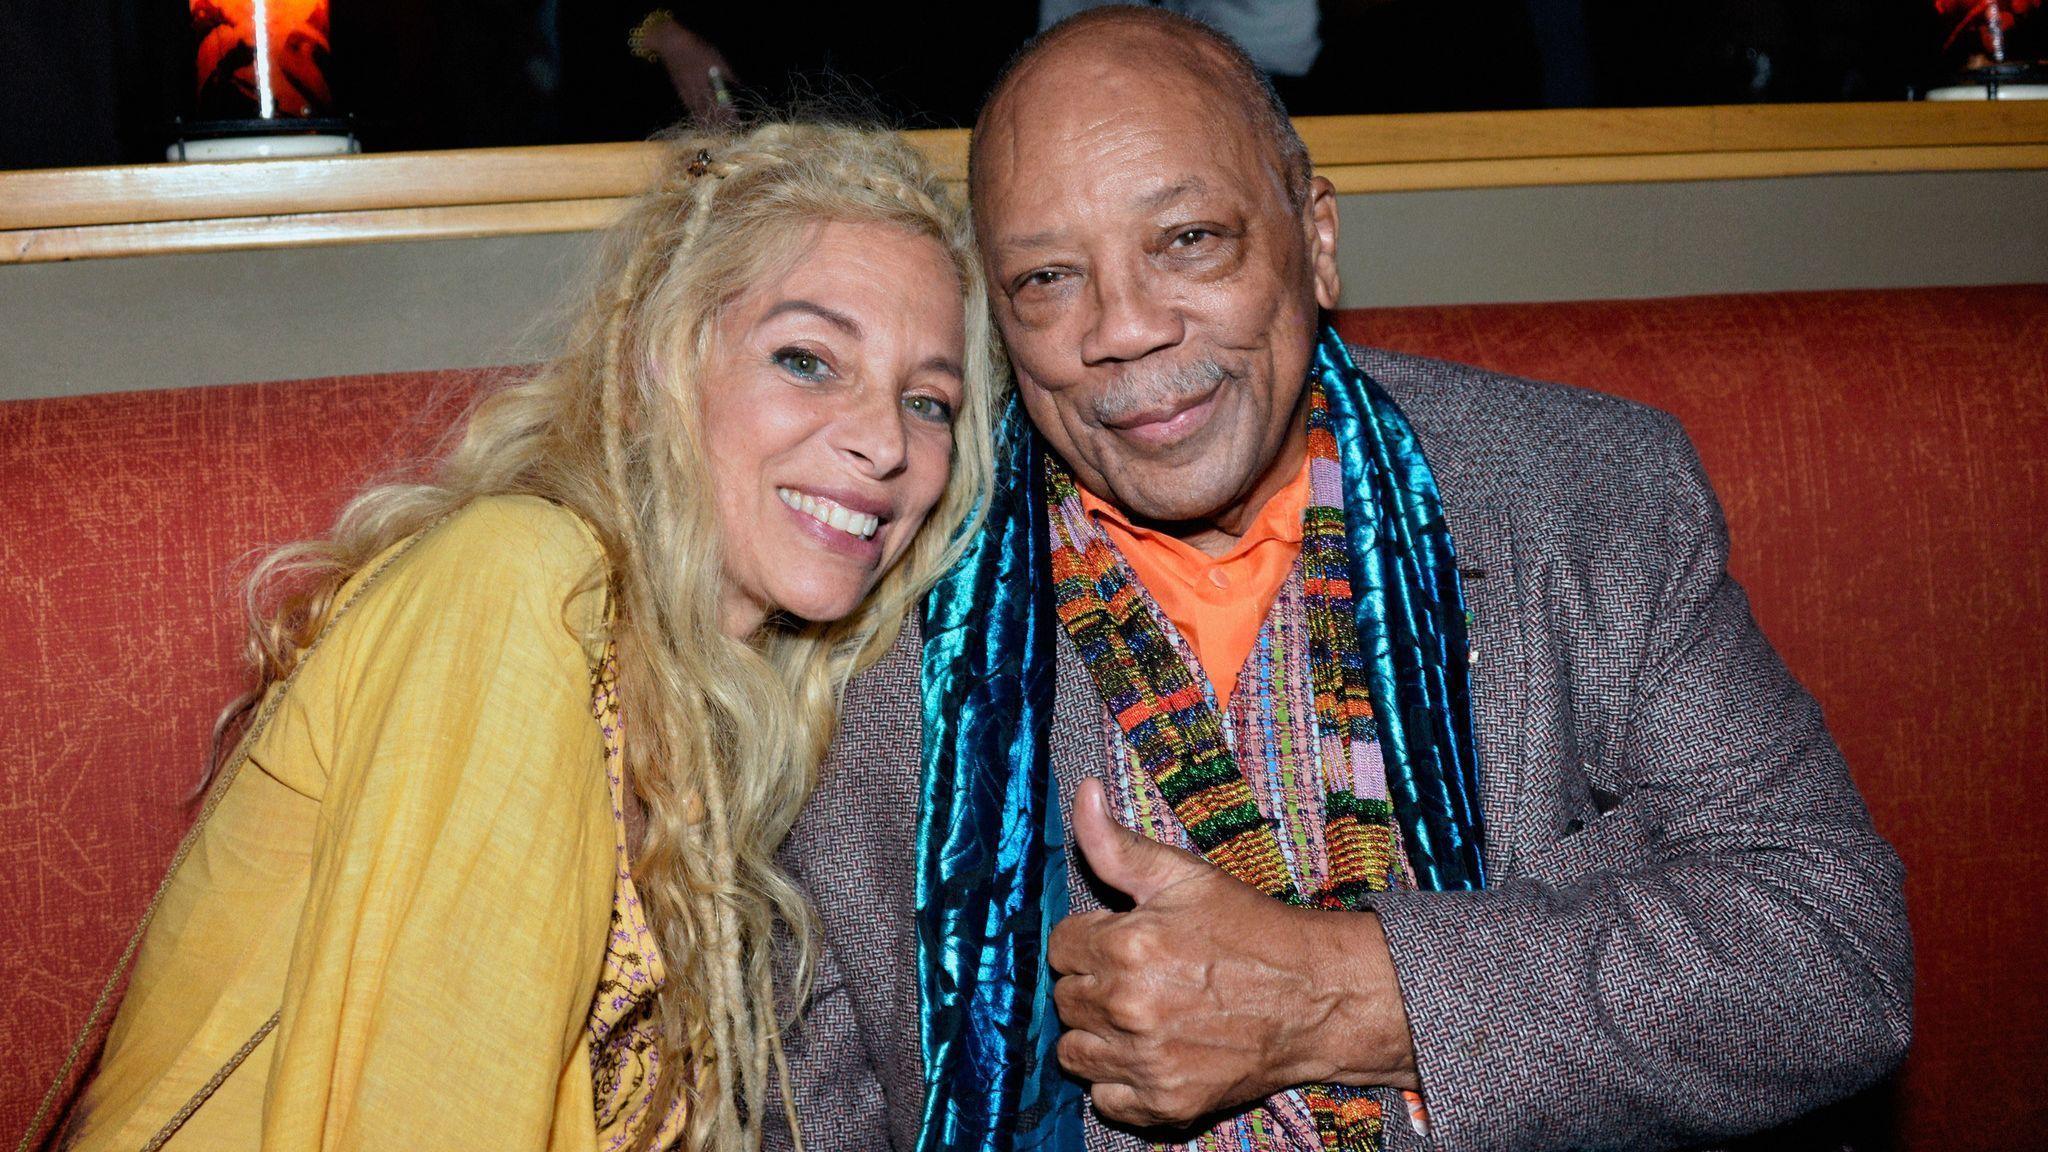 Quincy Jones Hosts Jazz Foundation L.A. Fundraiser - Honoring Johnny Mathis